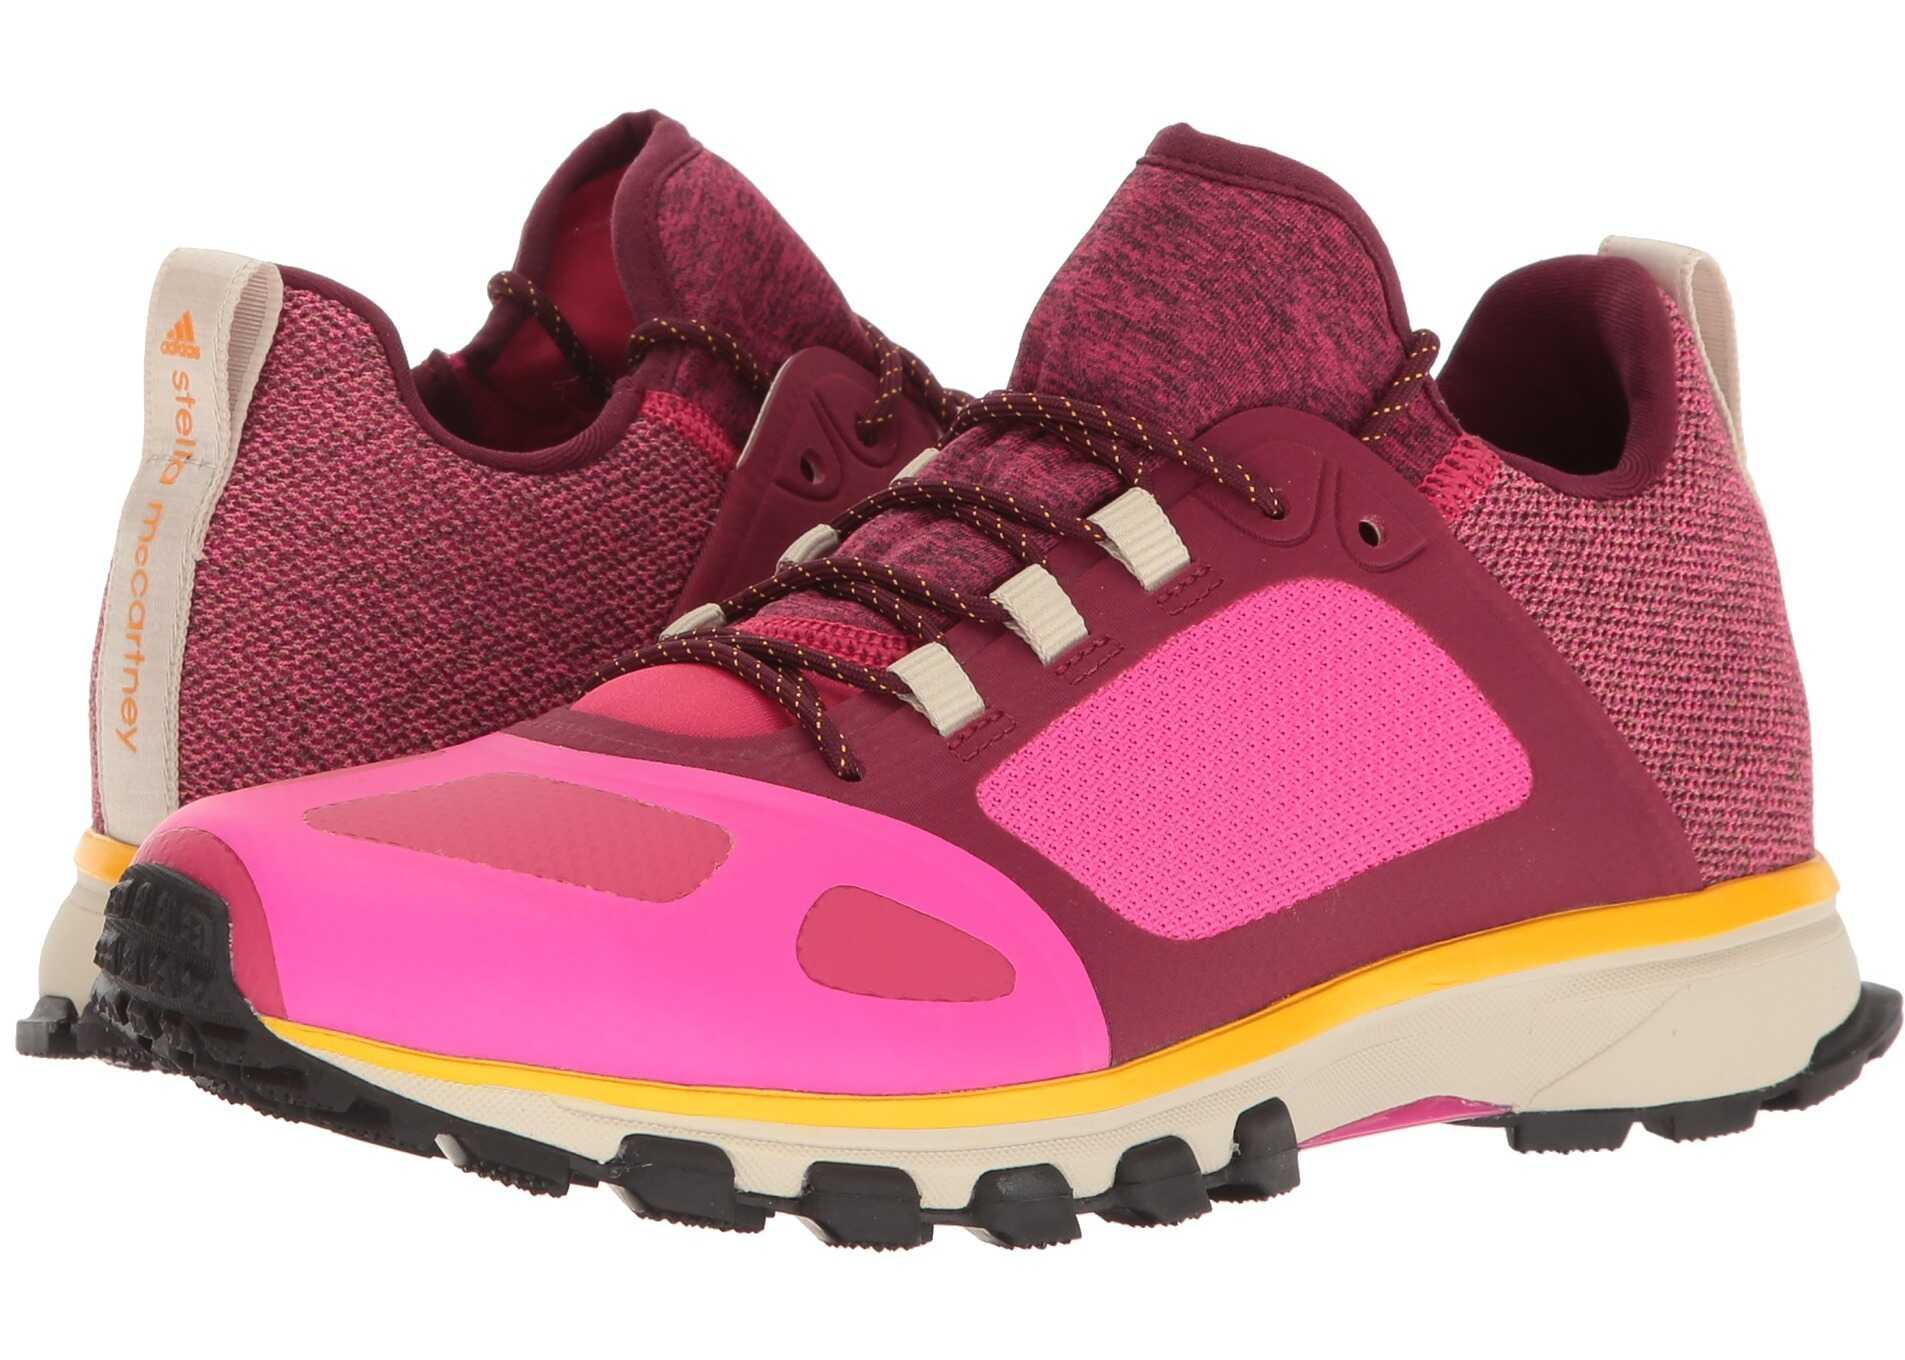 adidas by Stella McCartney Adizero Xt Shock Pink/Ruby Red/Cherry Wood